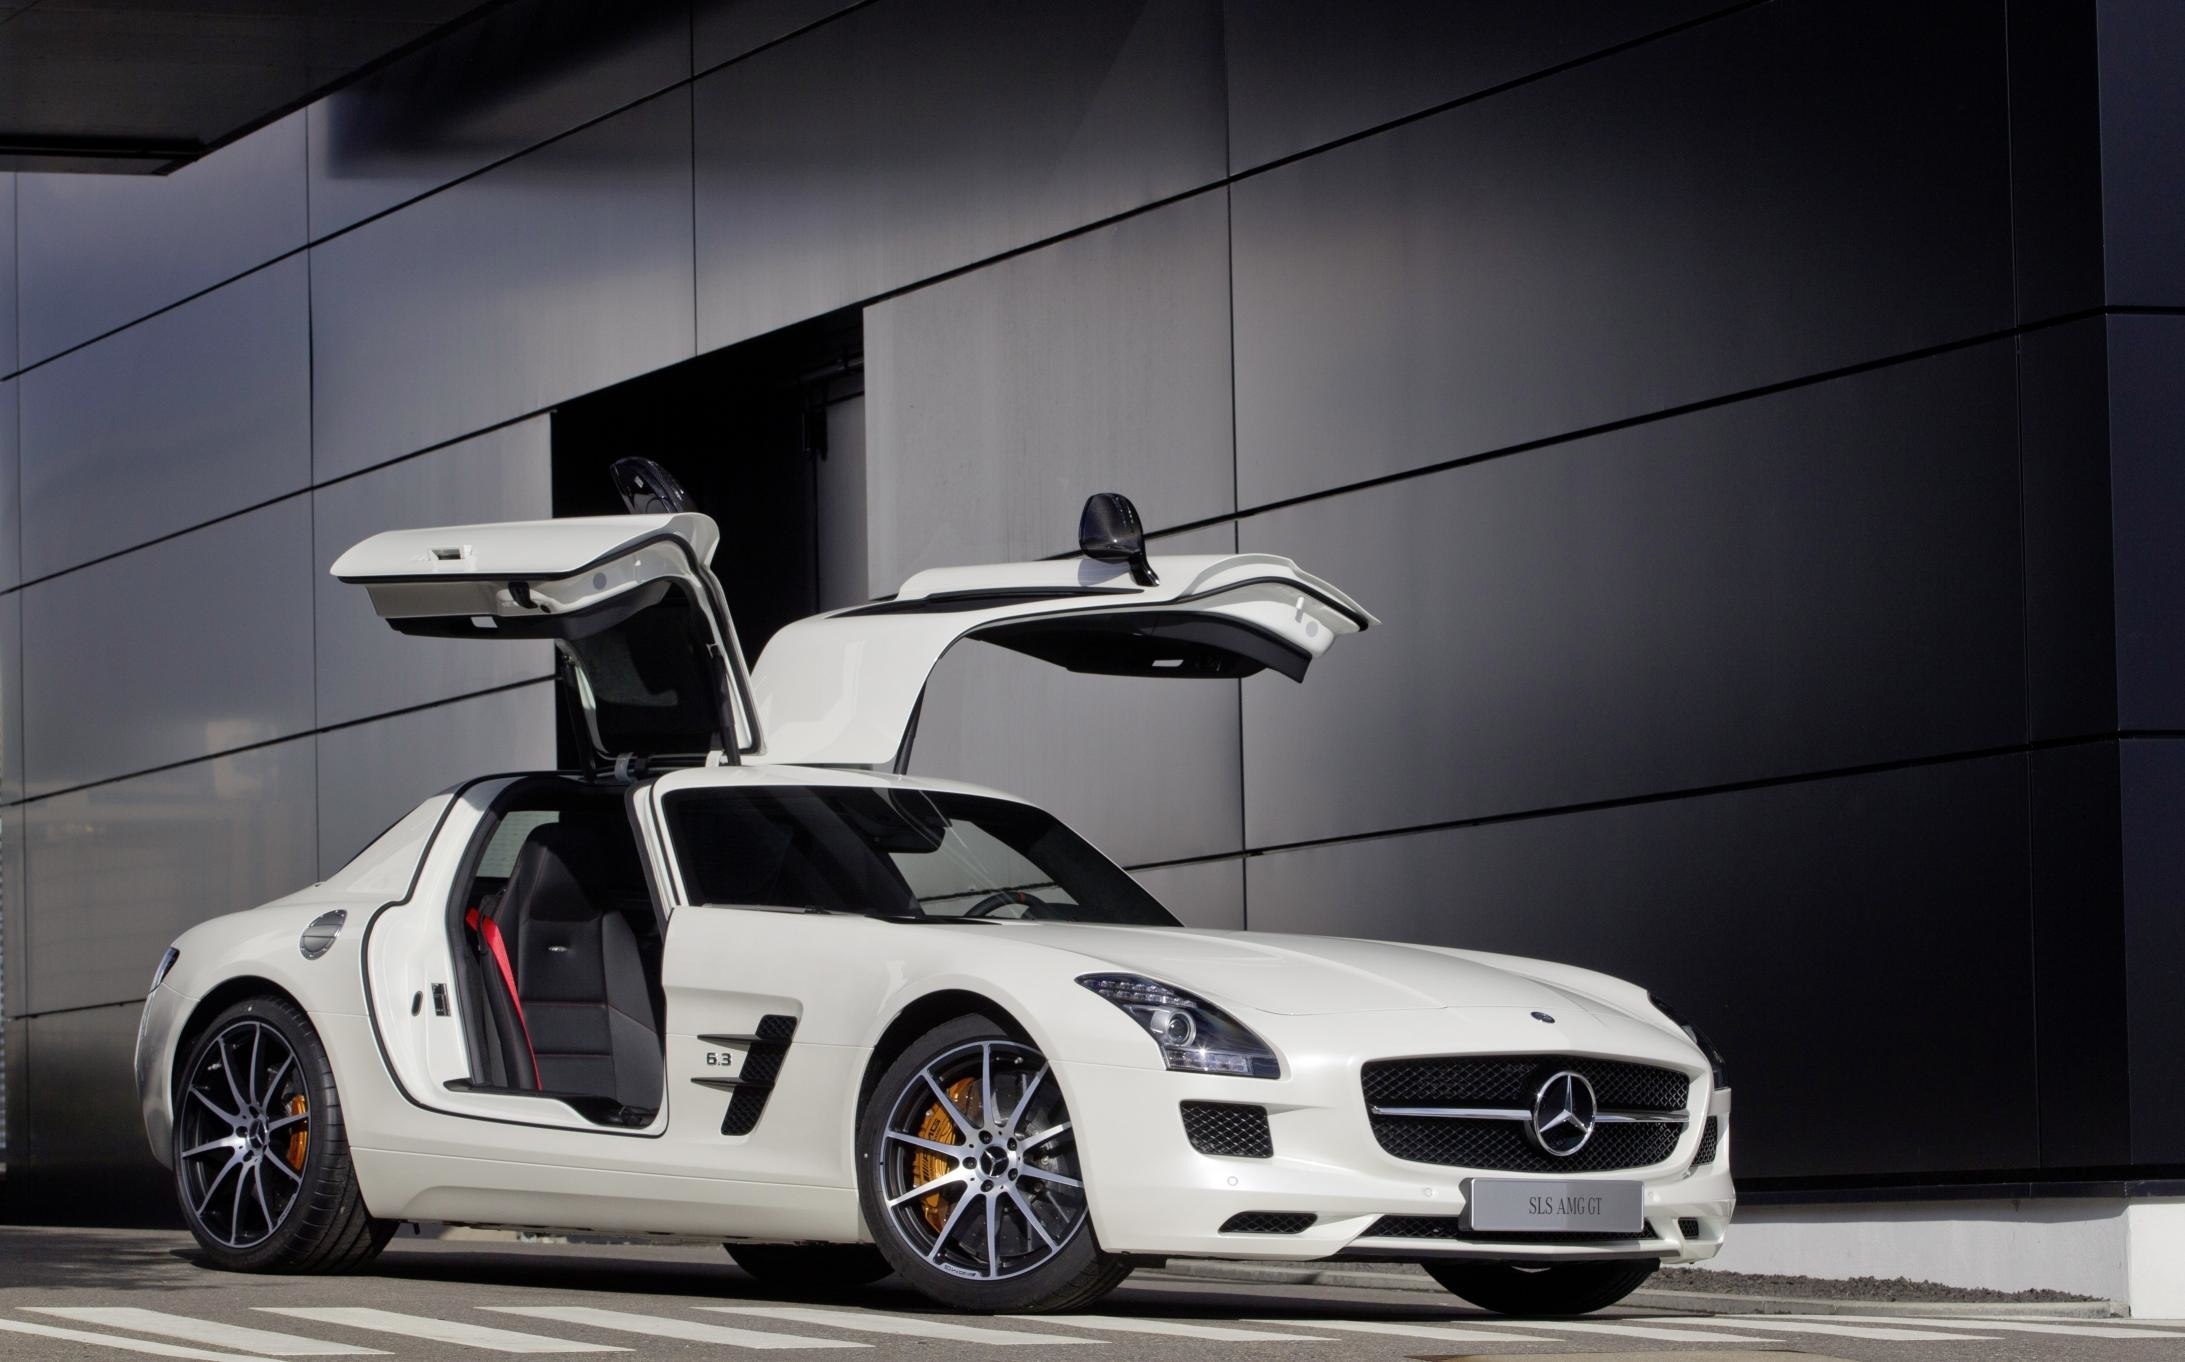 Mercedes Benz Amg Wallpaper 75 Pictures